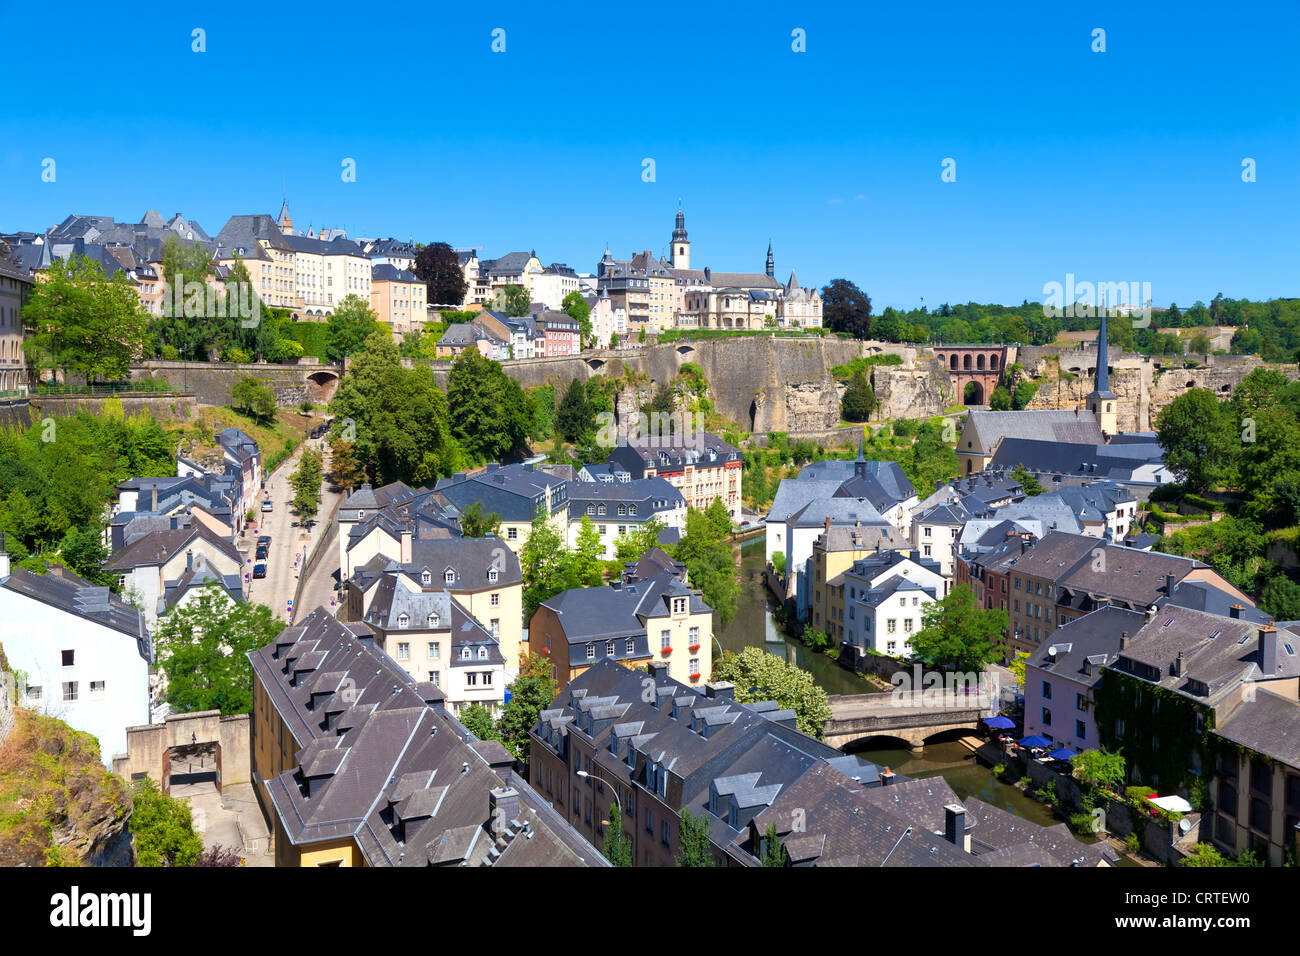 Luxemburg-Stadt-Panorama an einem sonnigen Sommertag Stockbild